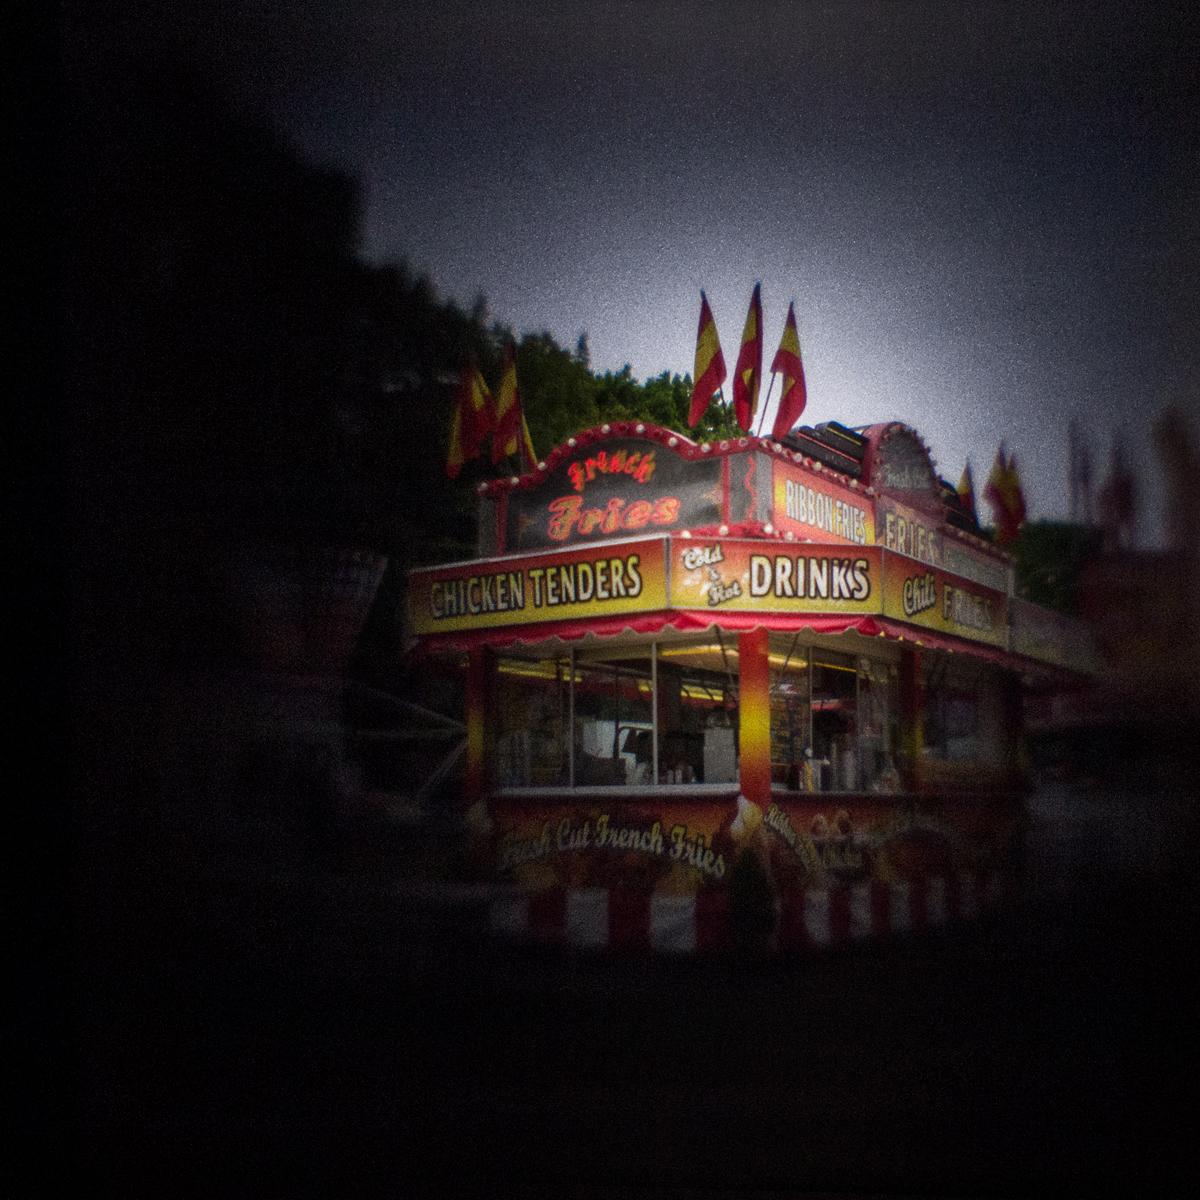 Vivona Carnival, French Fries